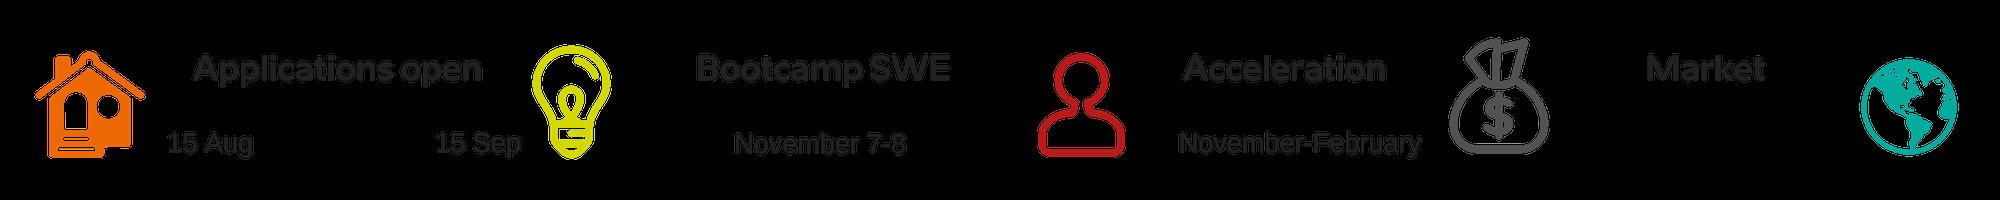 Smartup Accelerator timeline NEW (3)